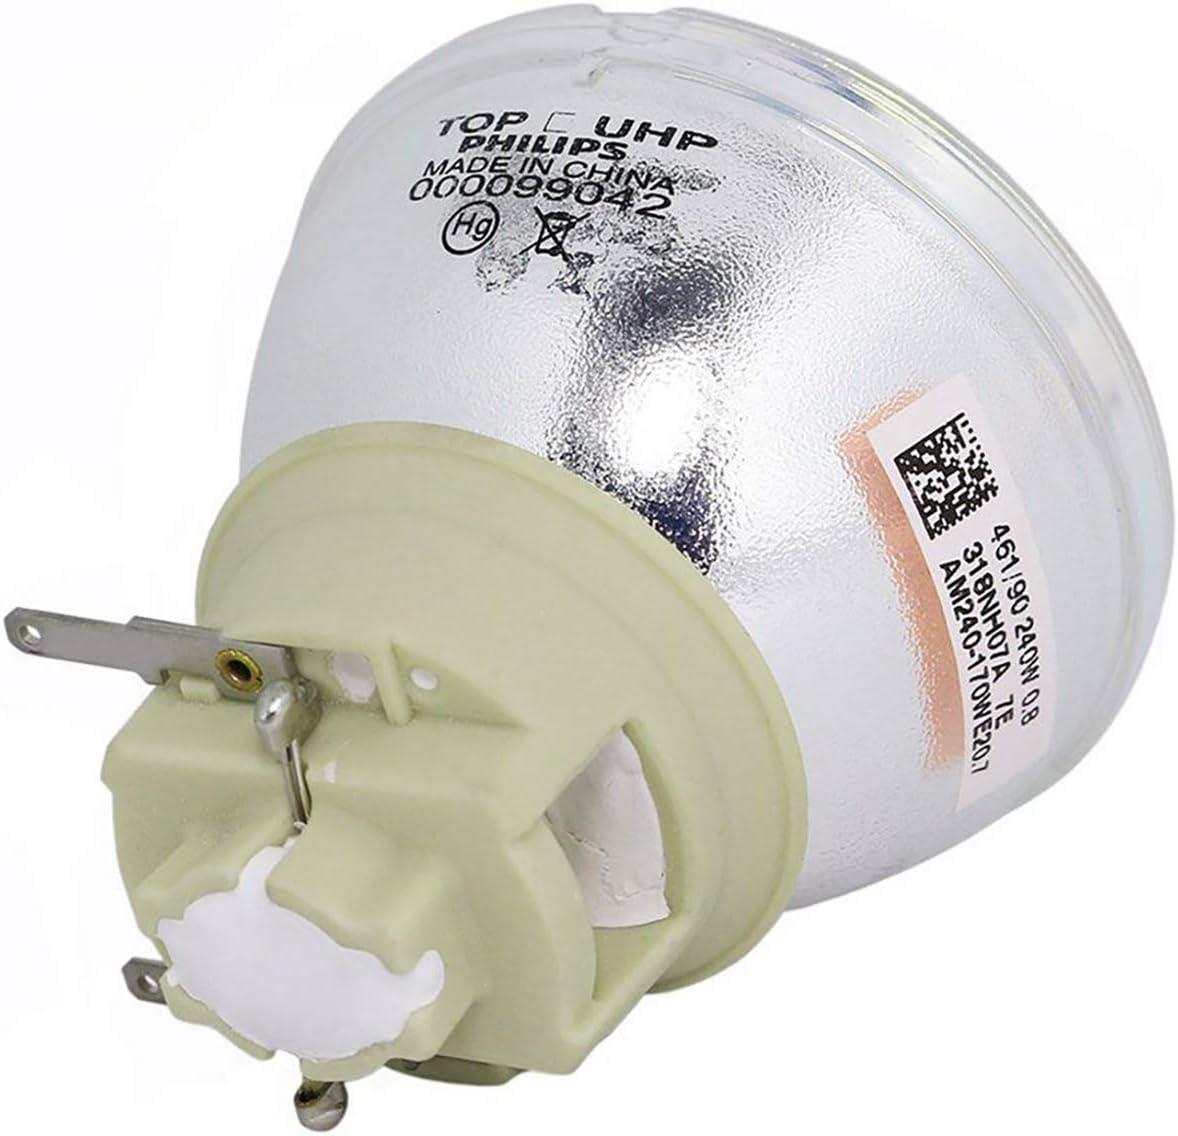 SP.7AZ01GC01 for Optoma WU334 HD143X WU336 EH334 EH336 HD27E Projector Lamp Original Bulb BL-FP240G